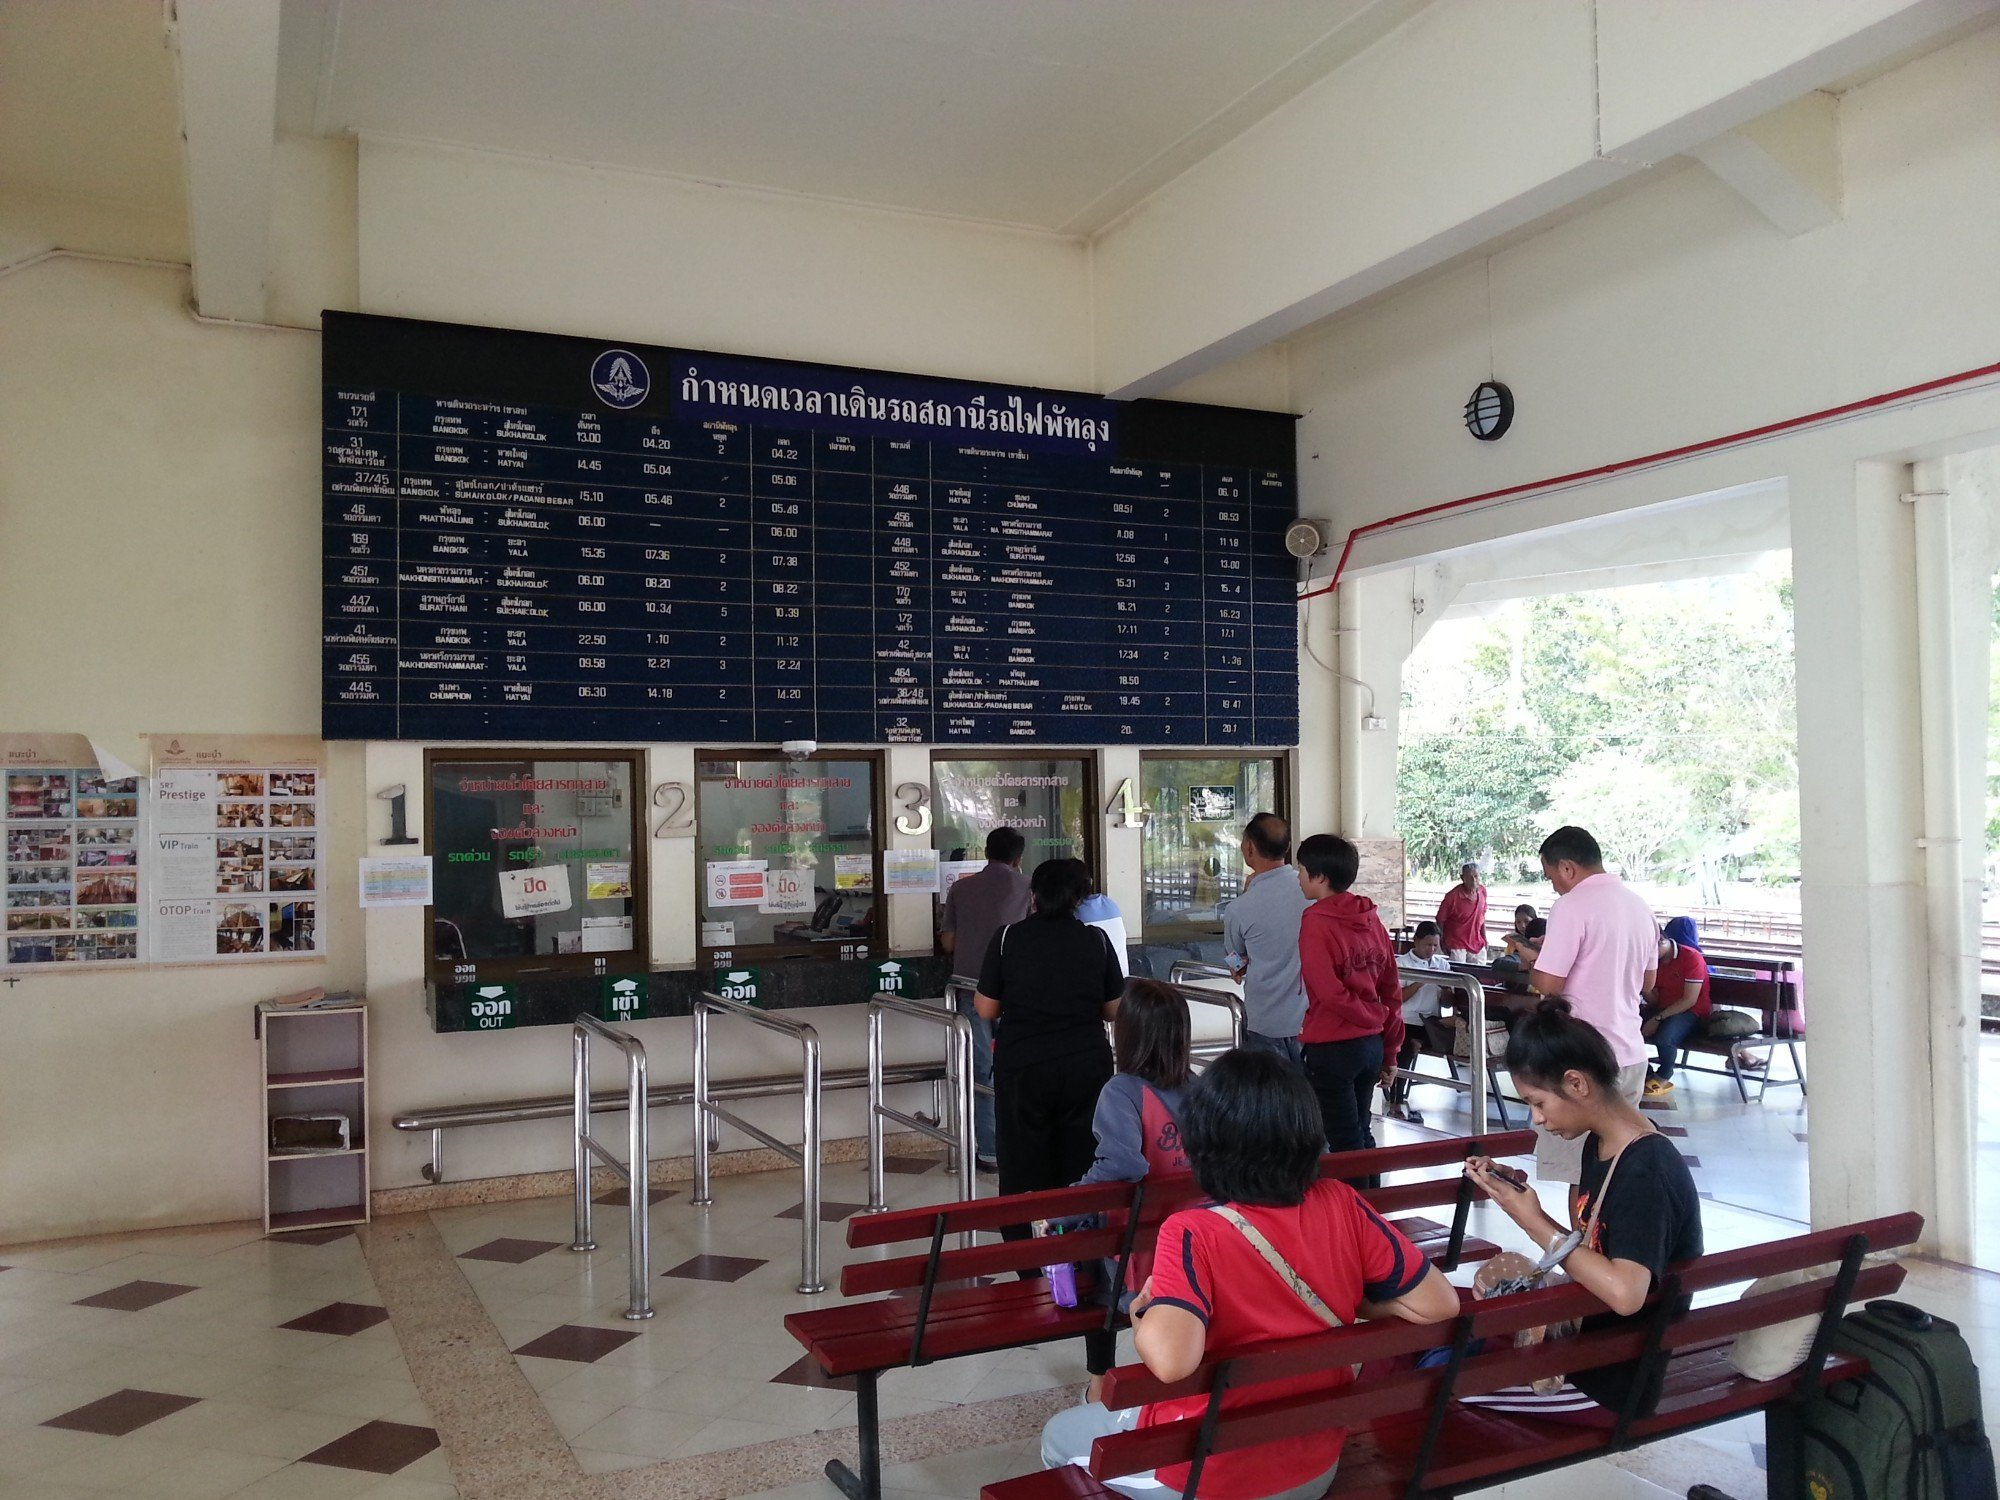 Ticket Office at Phatthalung Railway Station